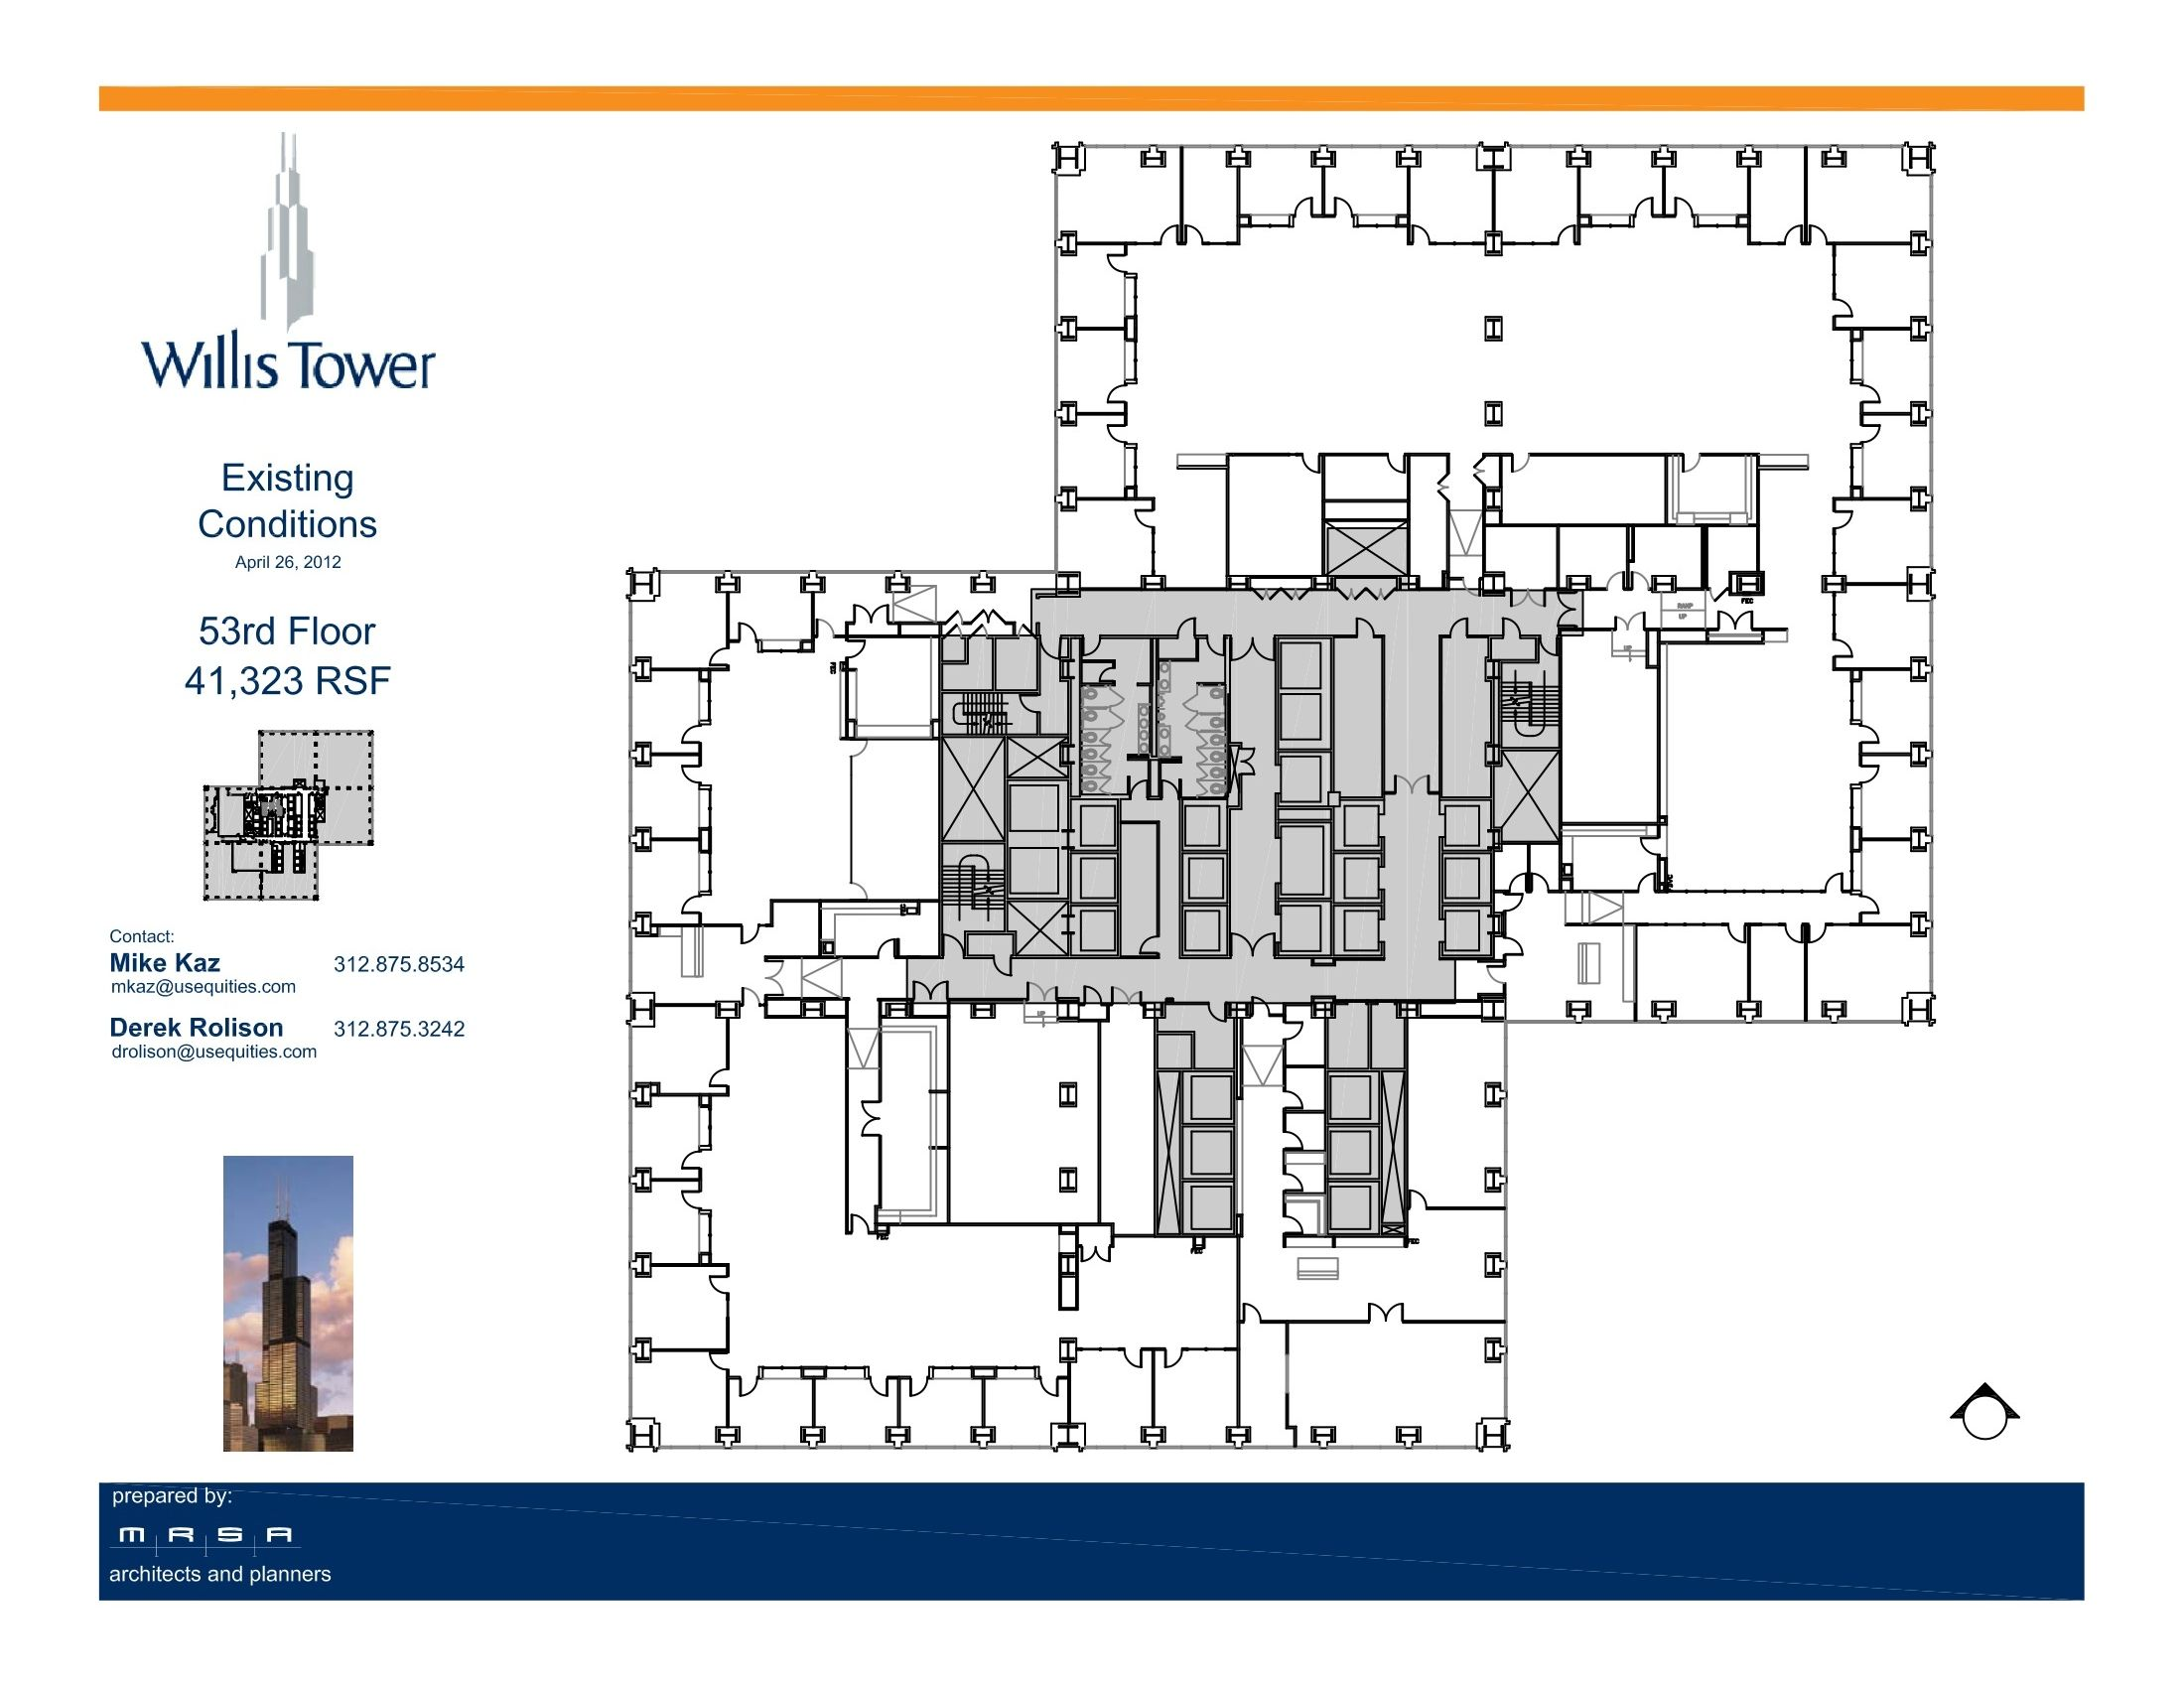 Willis Tower Floor Plans Chicago Il Usa ㉖ ѧ̼ʀ̼c̼н̼